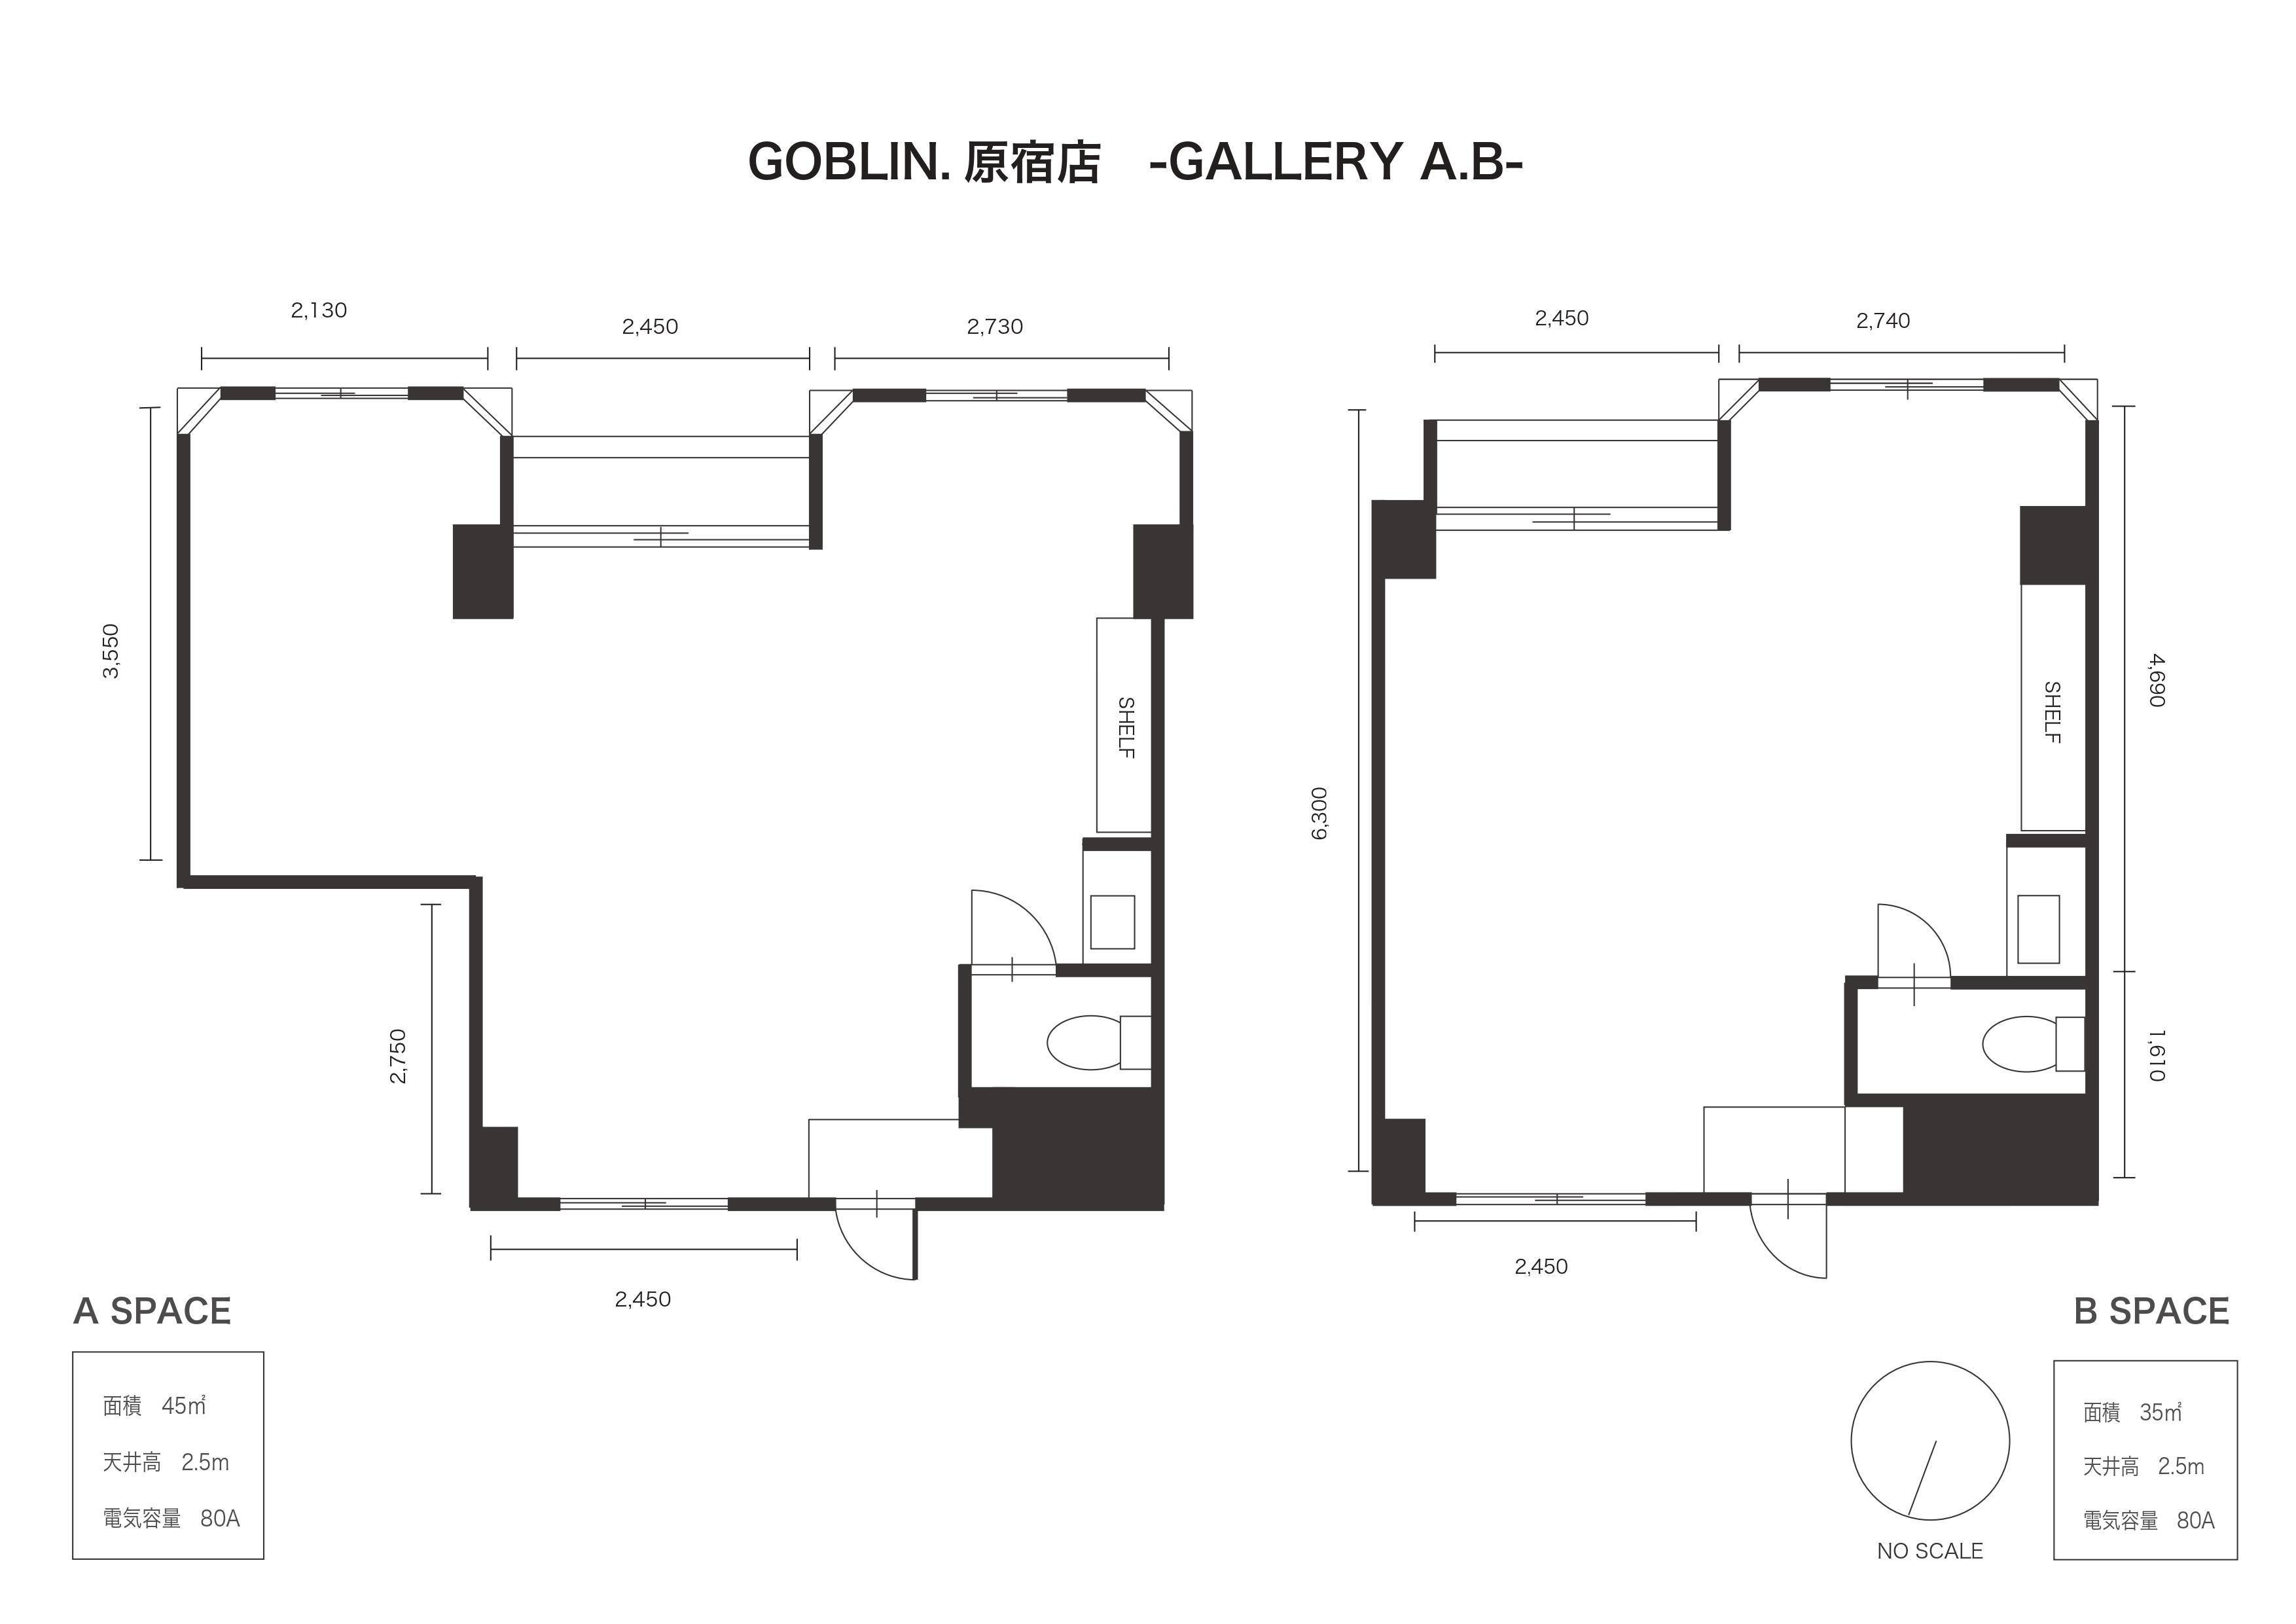 GOBLIN.原宿店 -GALLERY A-平面図